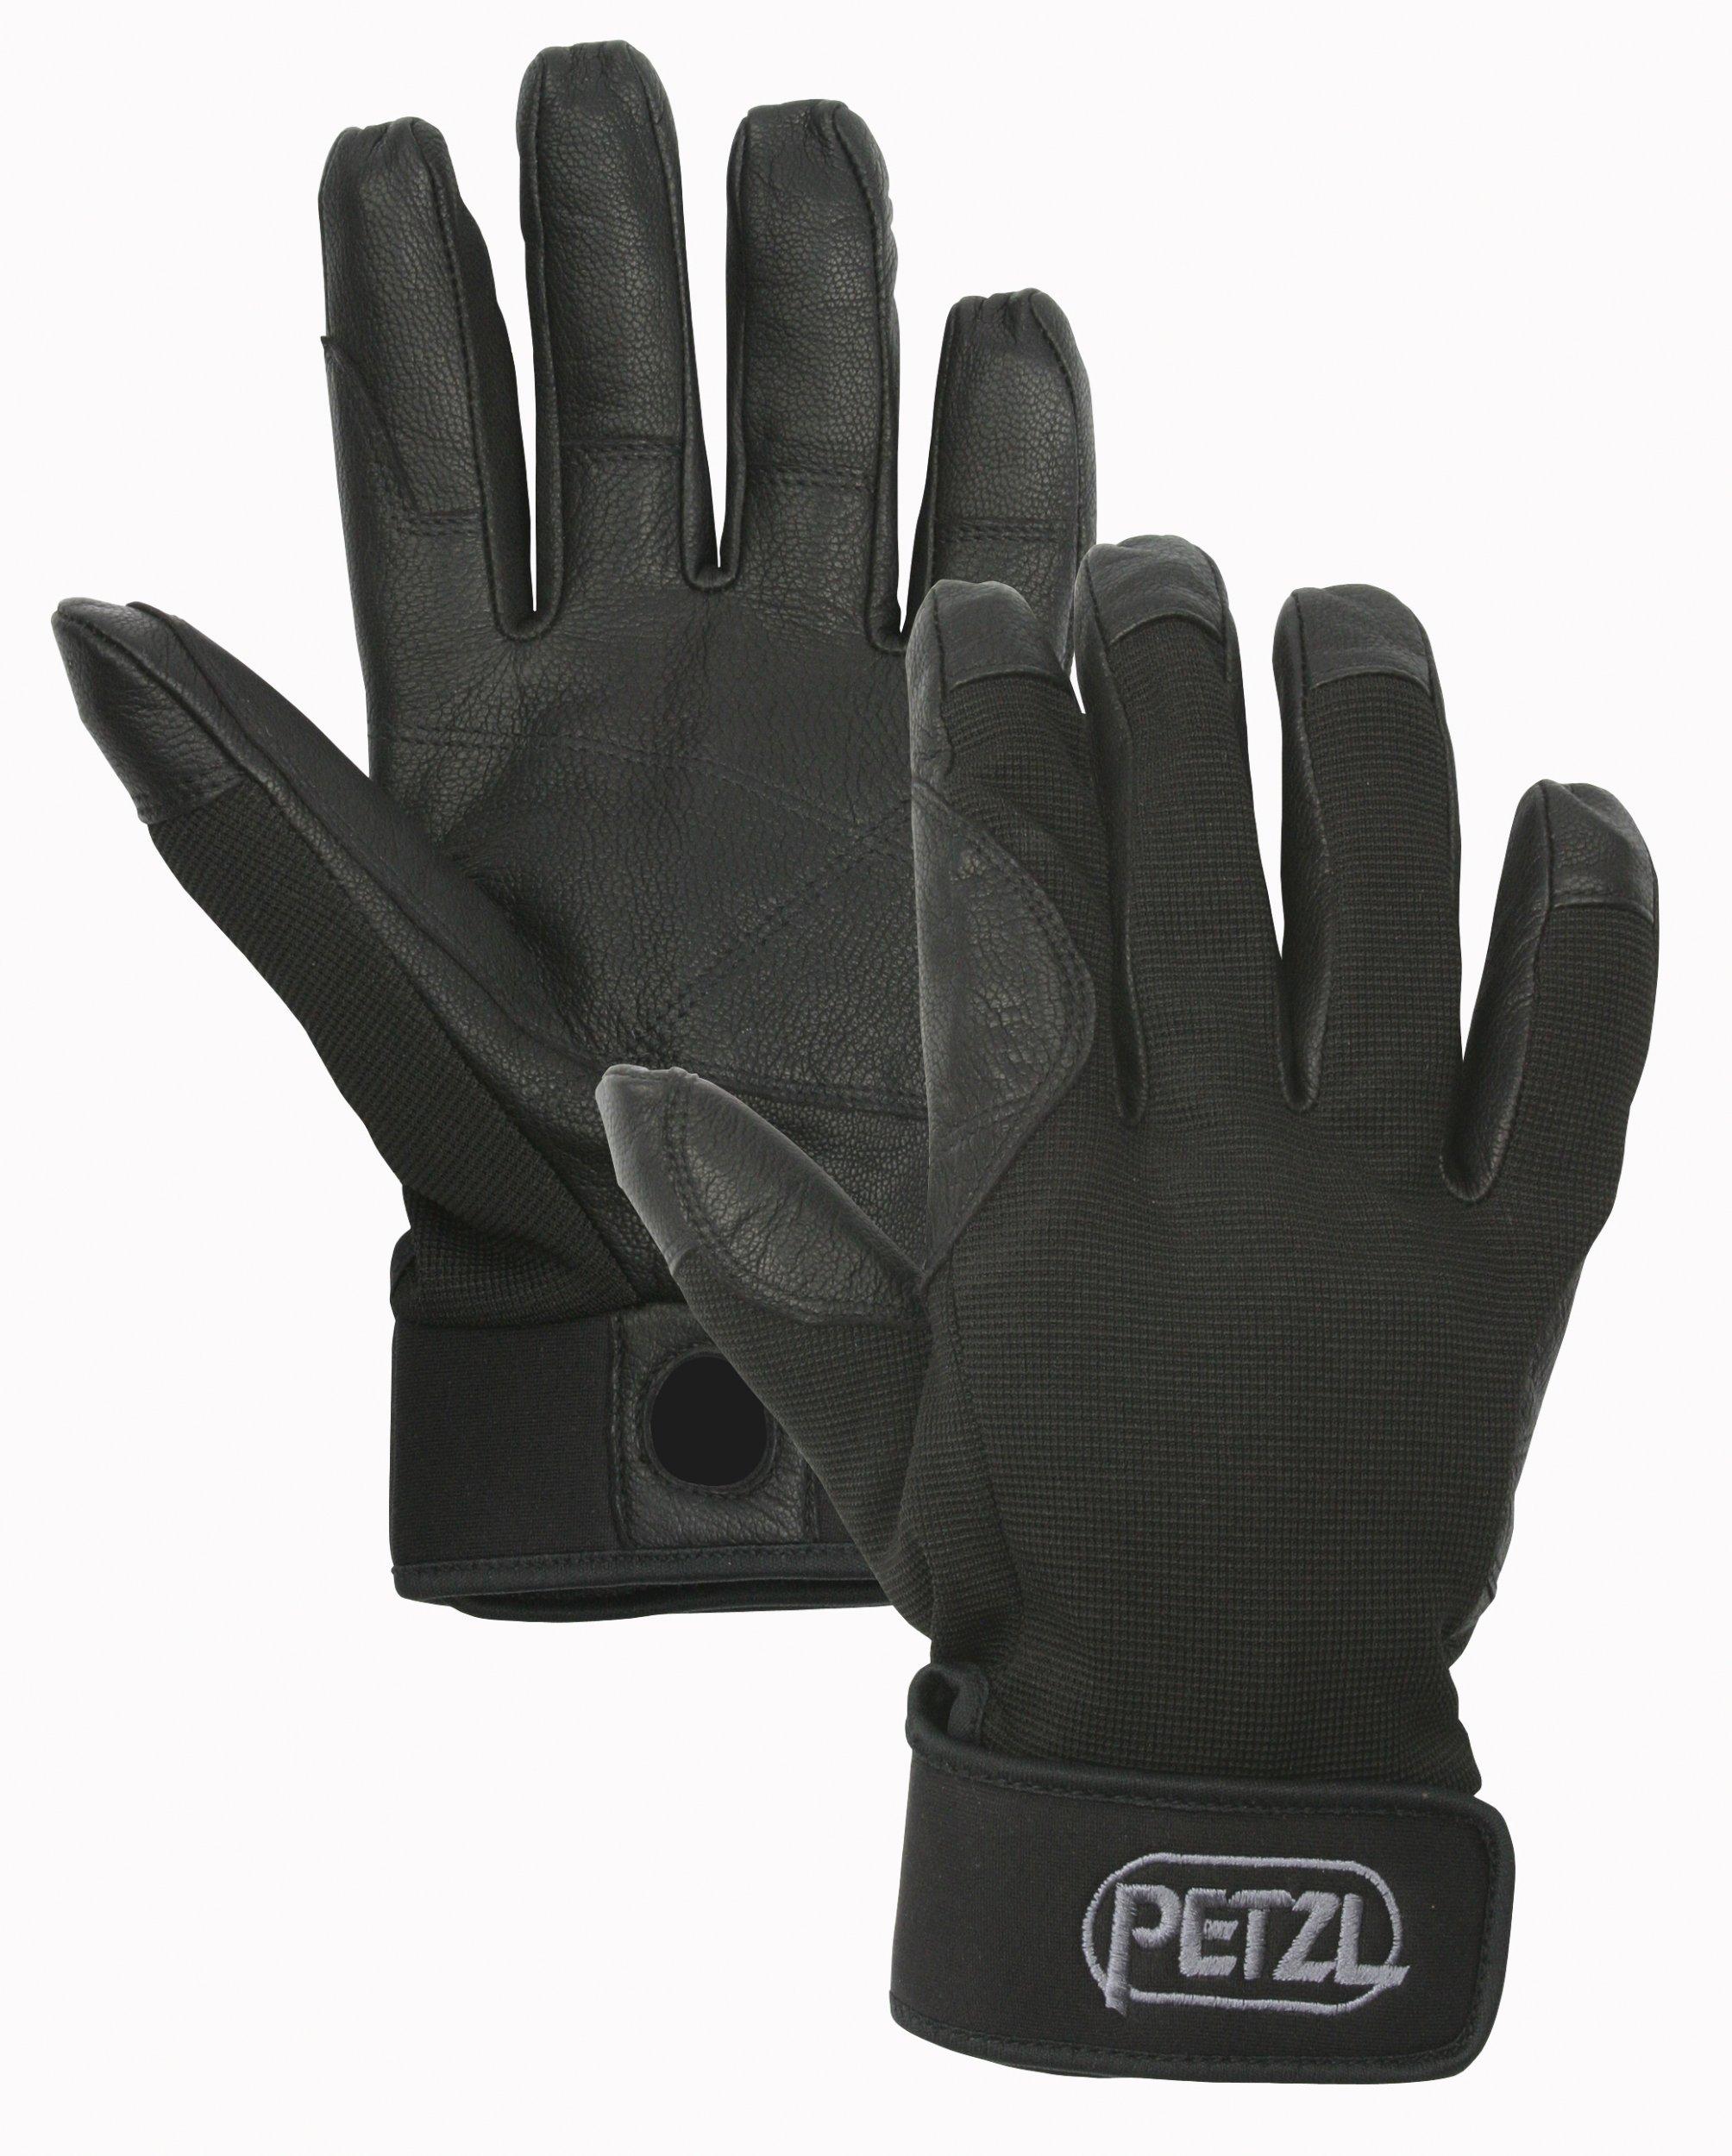 Petzl K52 CORDEX Lightweight Glove, Black, Small by Petzl (Image #1)